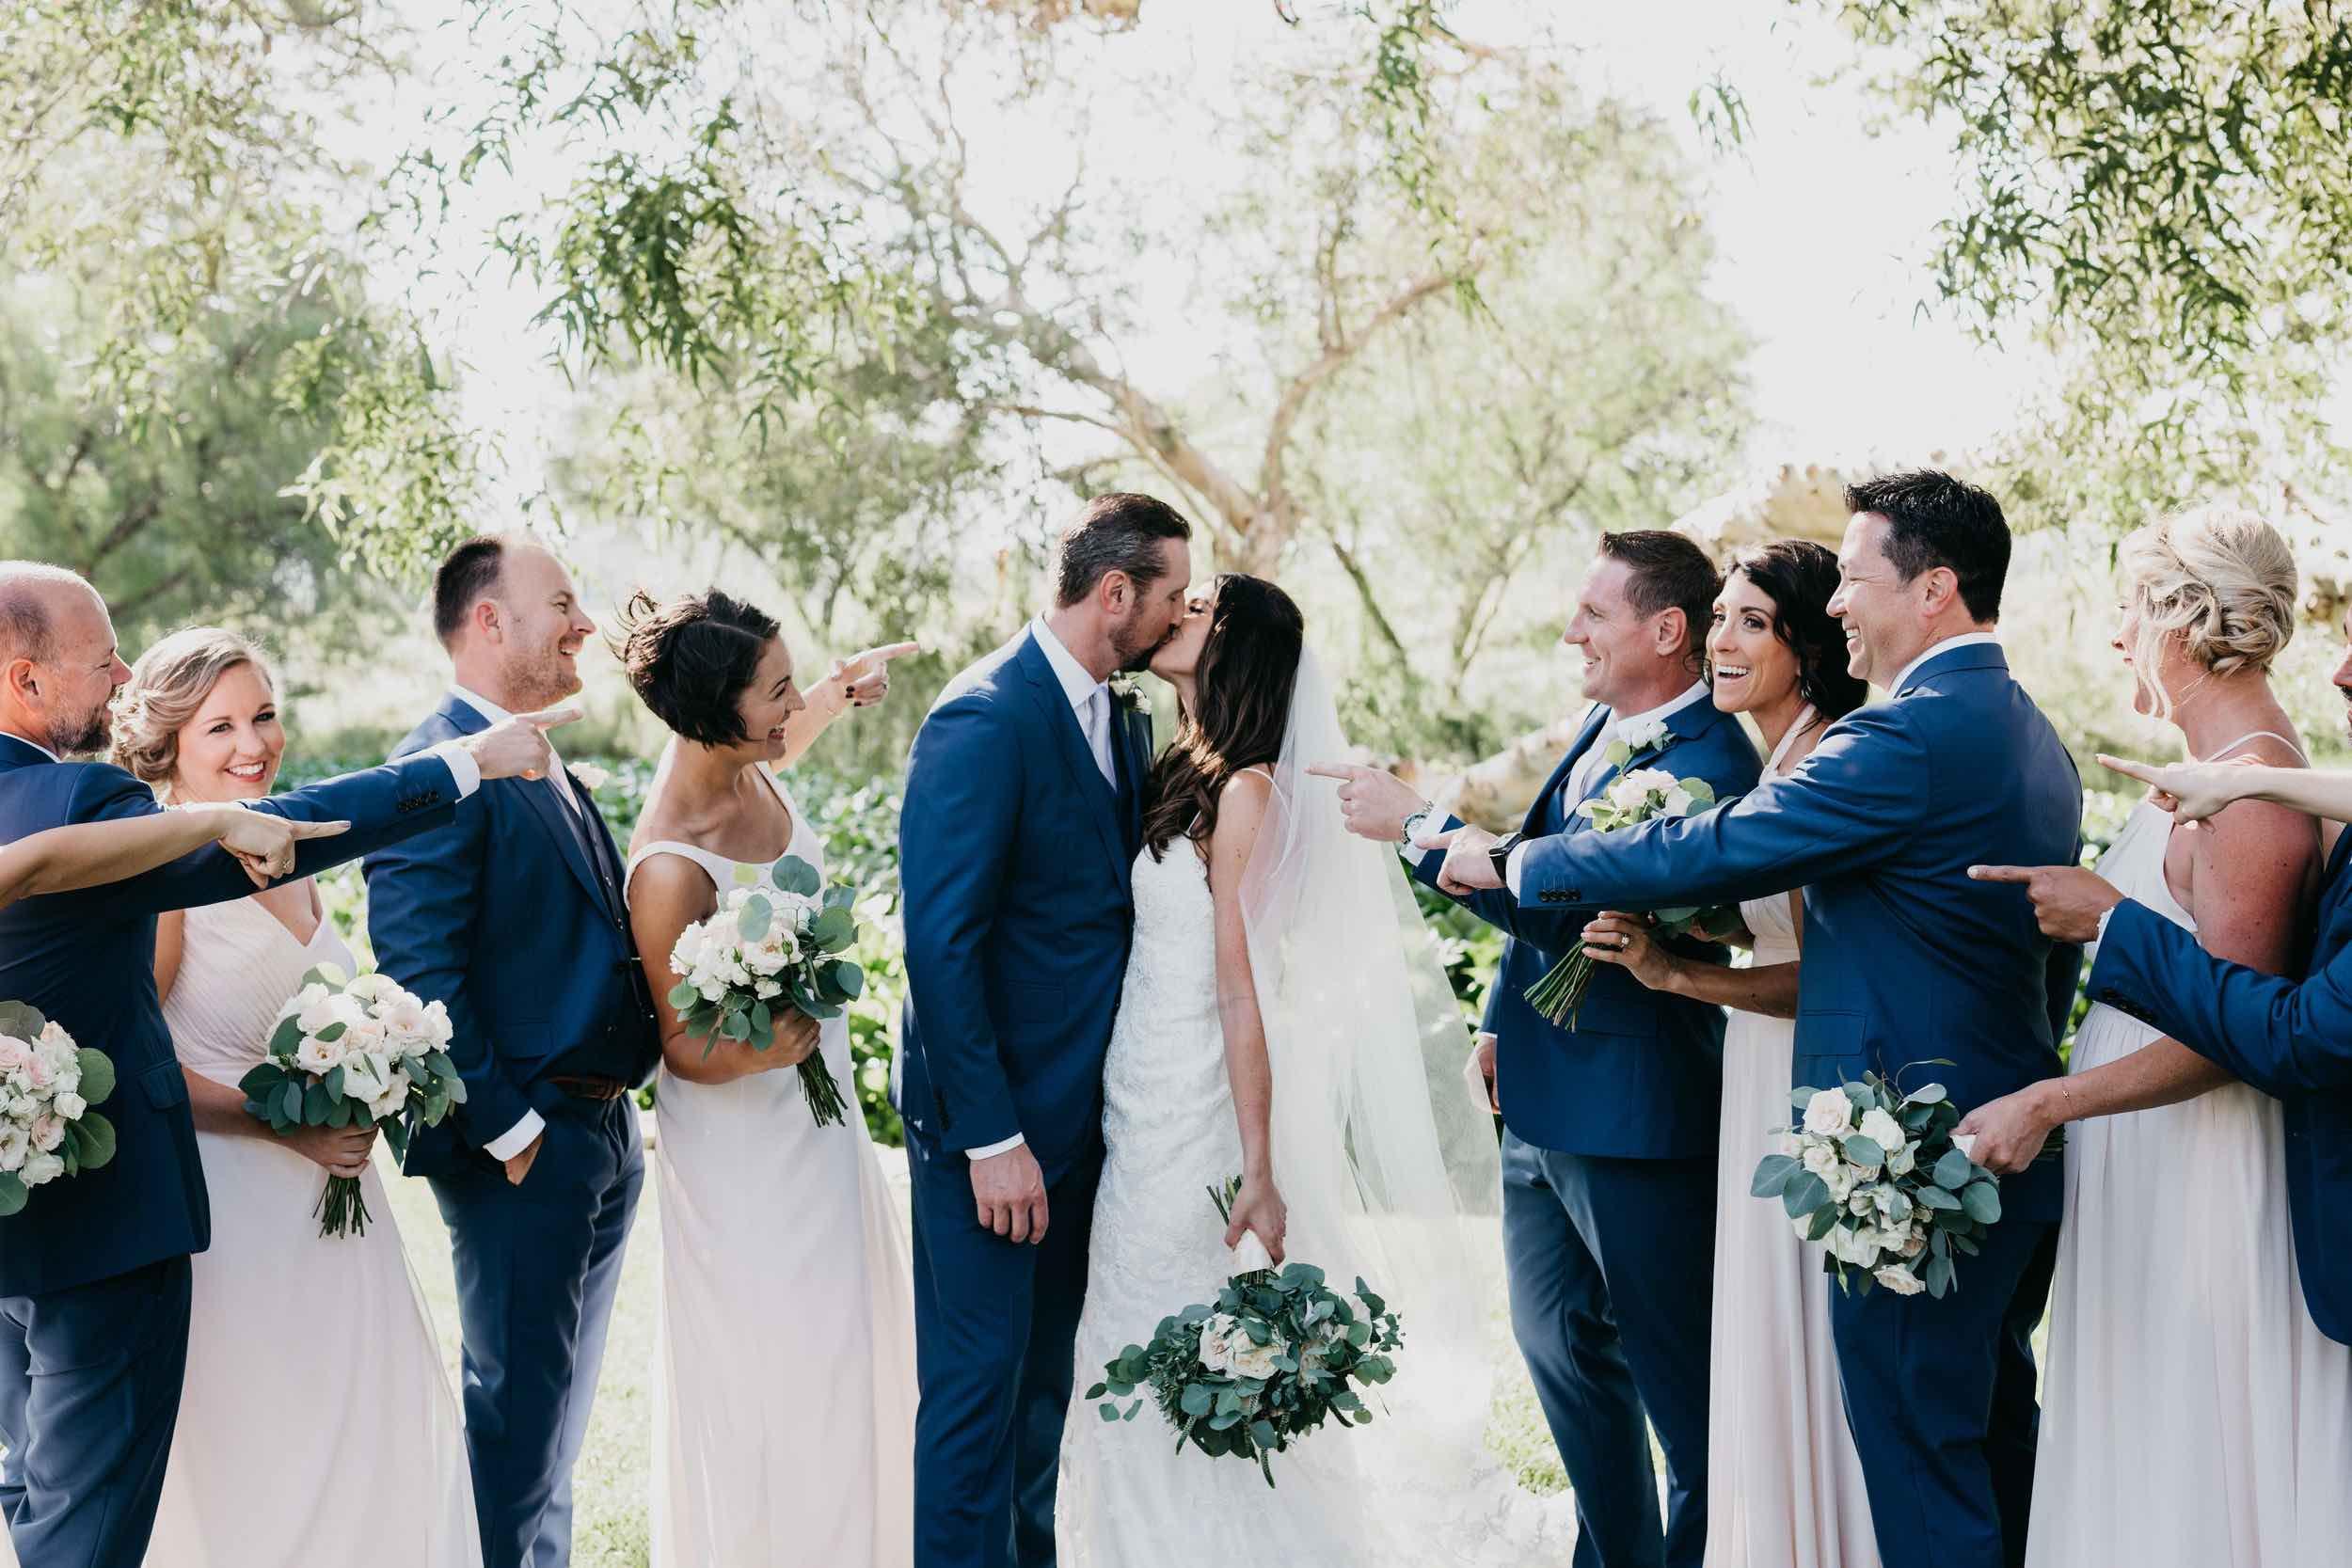 JesseandTodd_WeddingParty13.jpeg